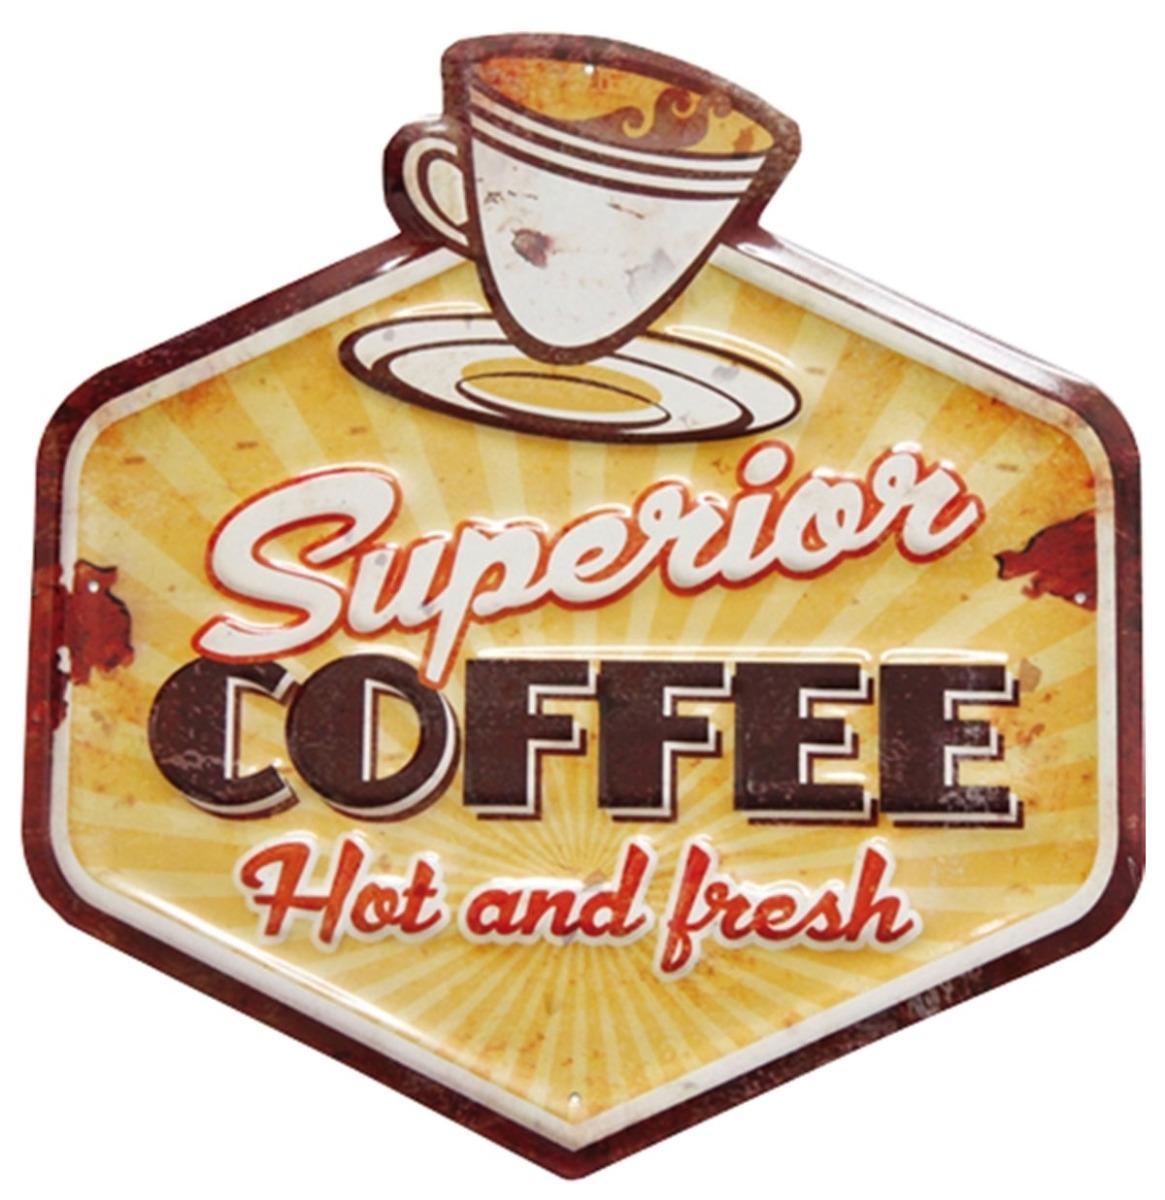 Superior Coffee Hot And Fresh Metalen Bord Met Reliëf - 30 x 32 cm